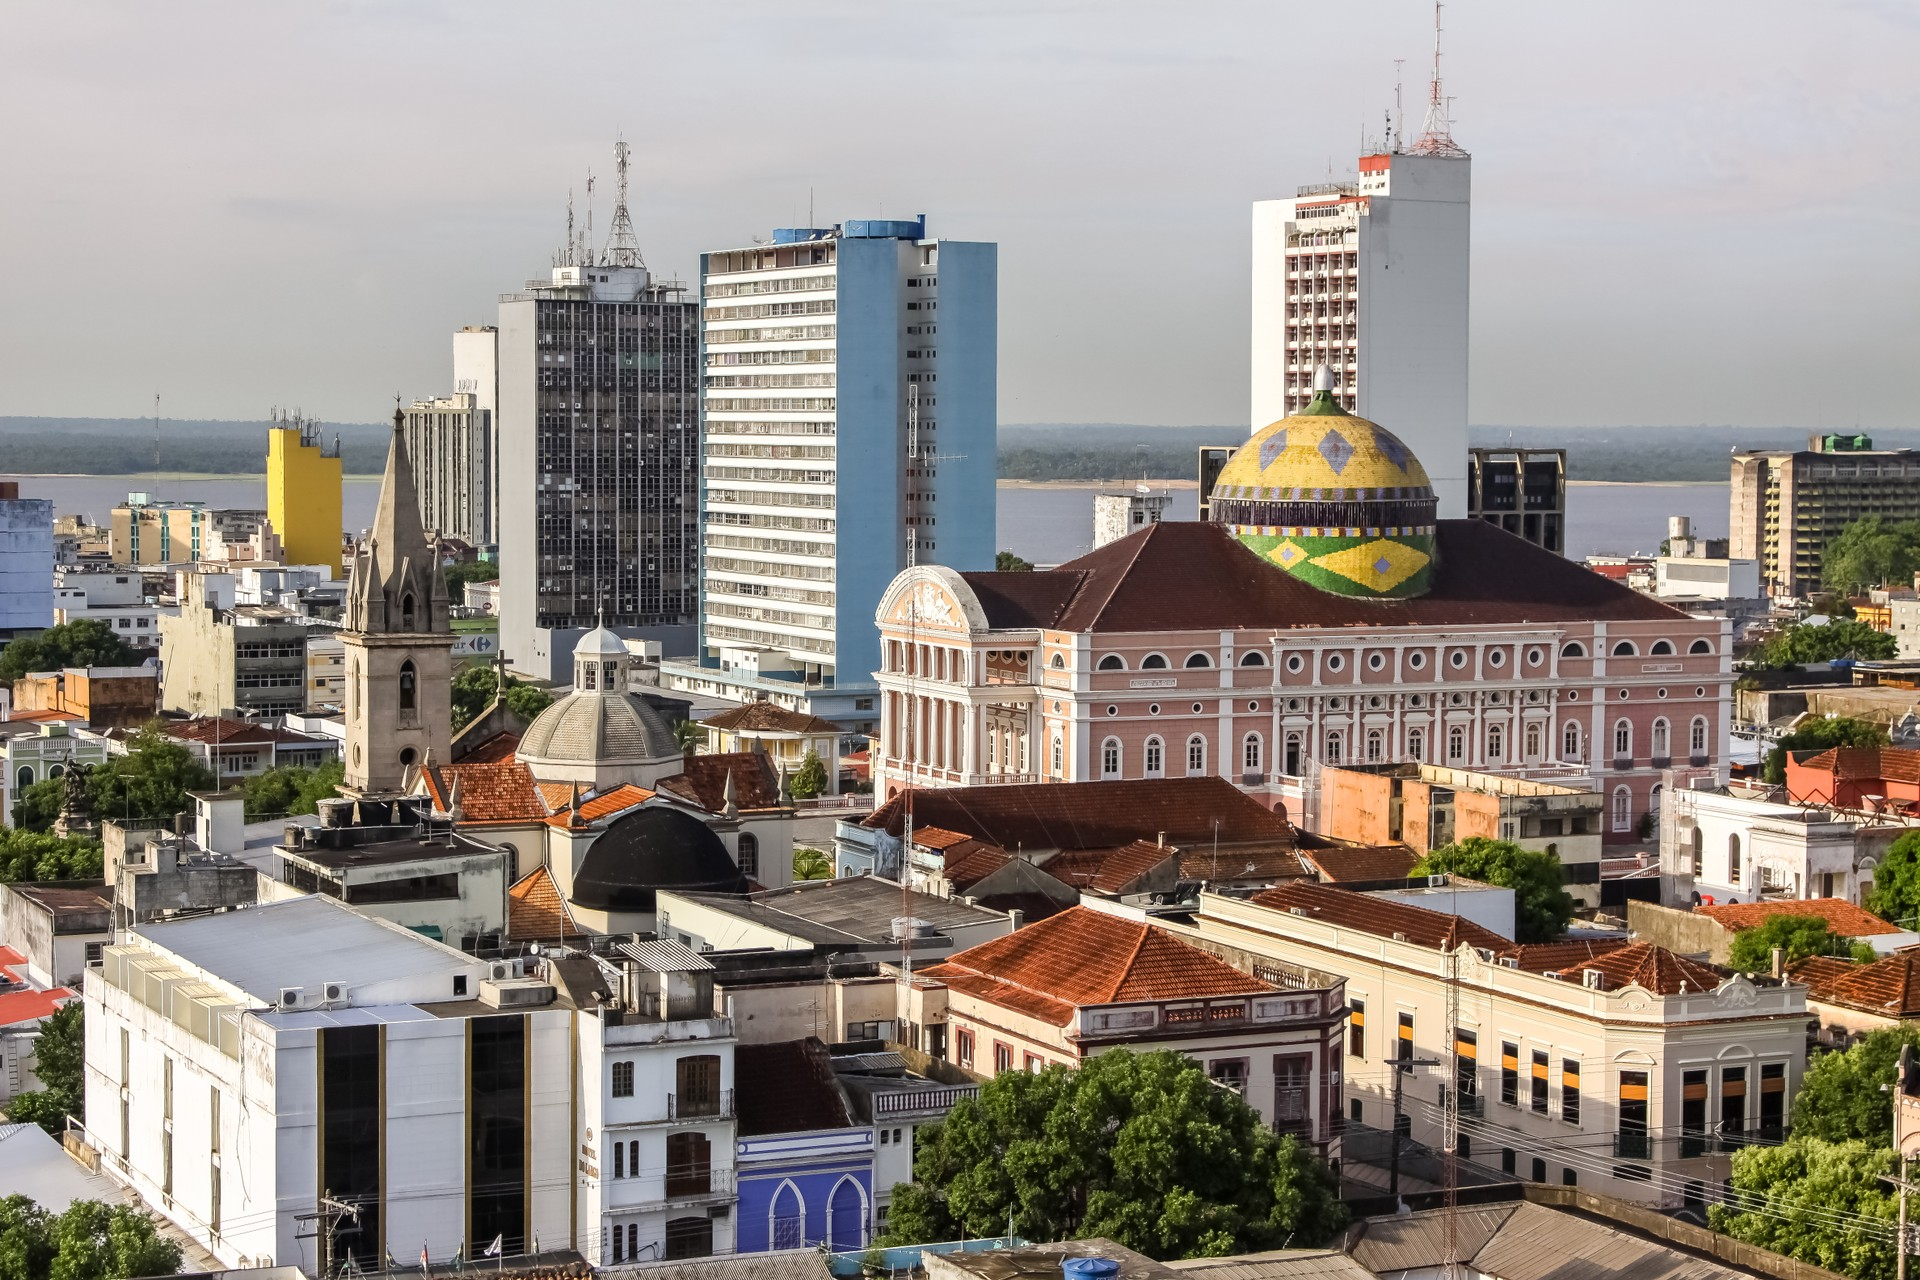 A cityscape of Manaus in Brazil's Amazon region